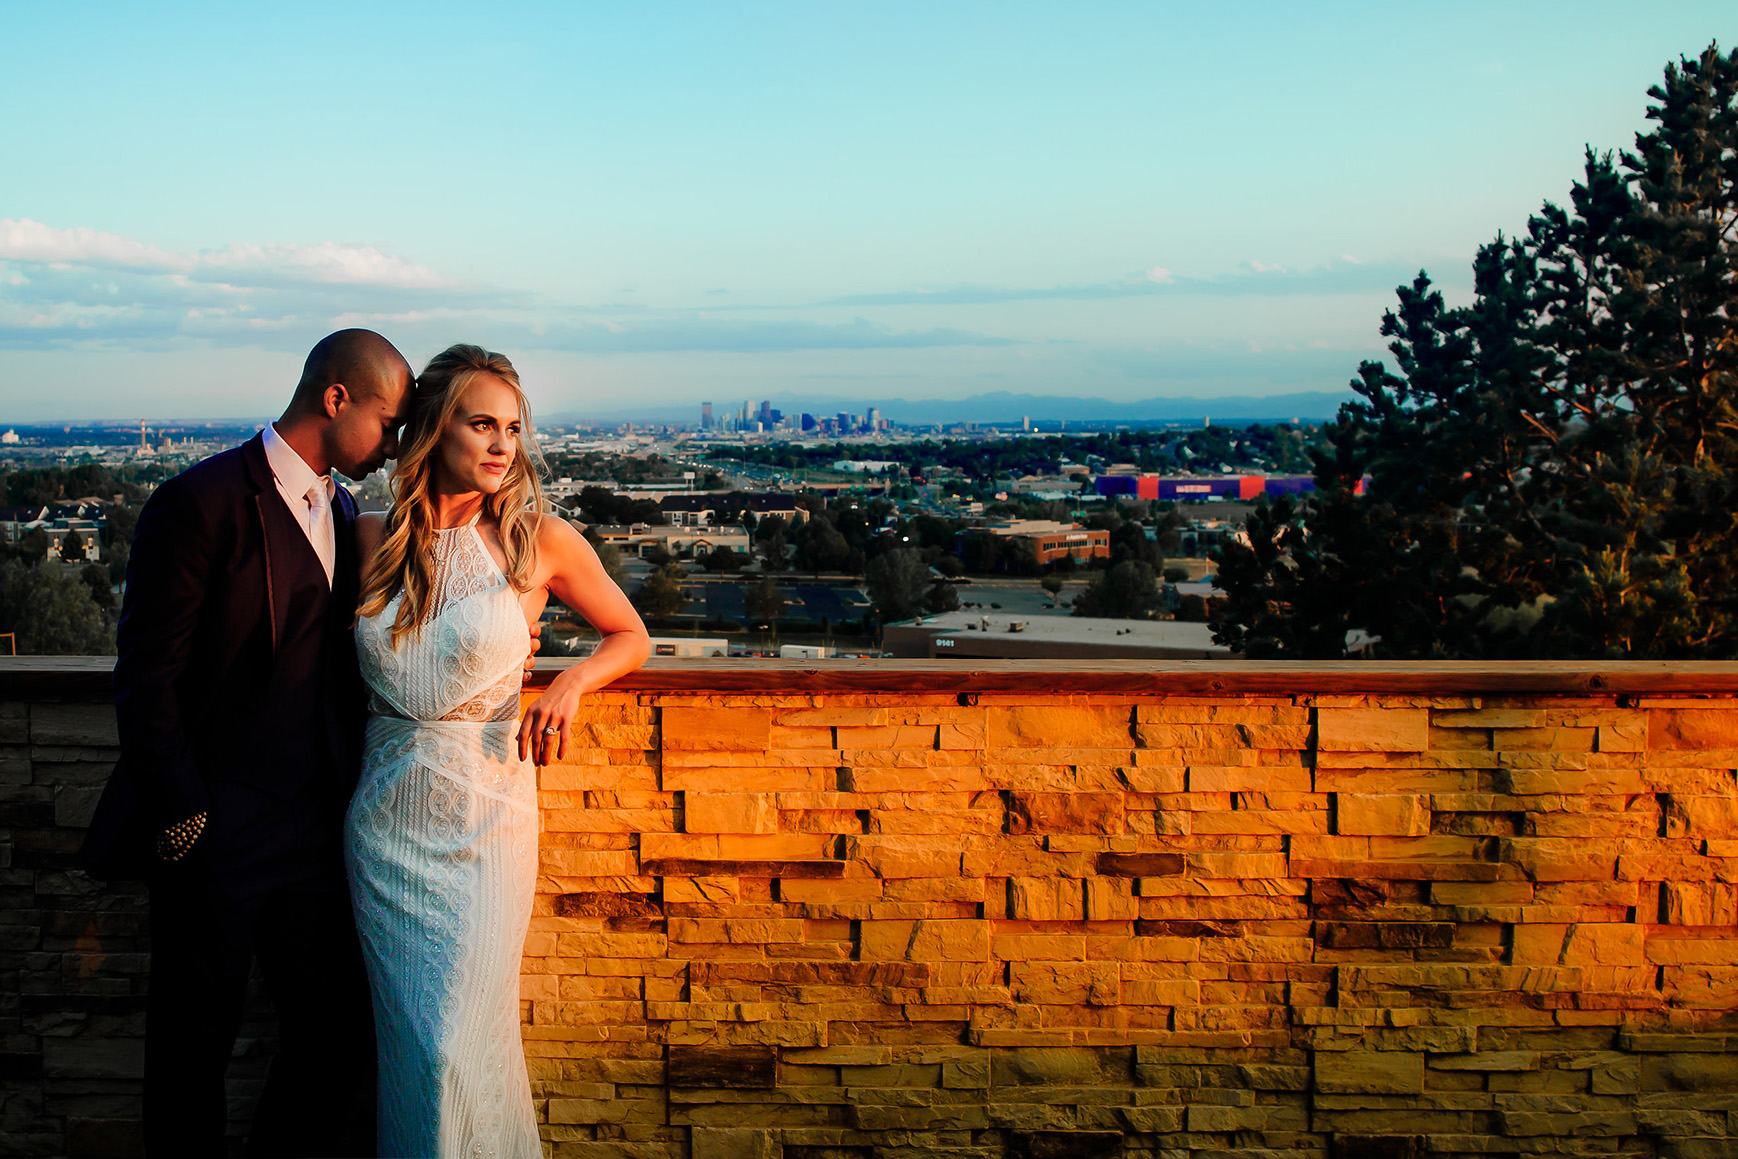 Estate wedding venue in Denver area - Brittany Hill - Thornton, Colorado - Adams County - Weld County - Wedgewood Weddings